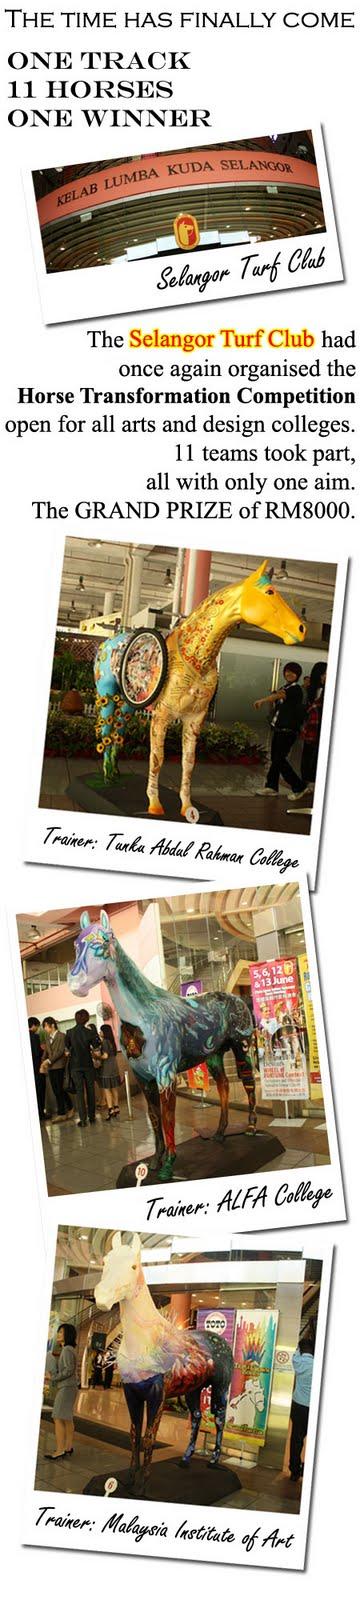 selangor turf club horse transformation 1